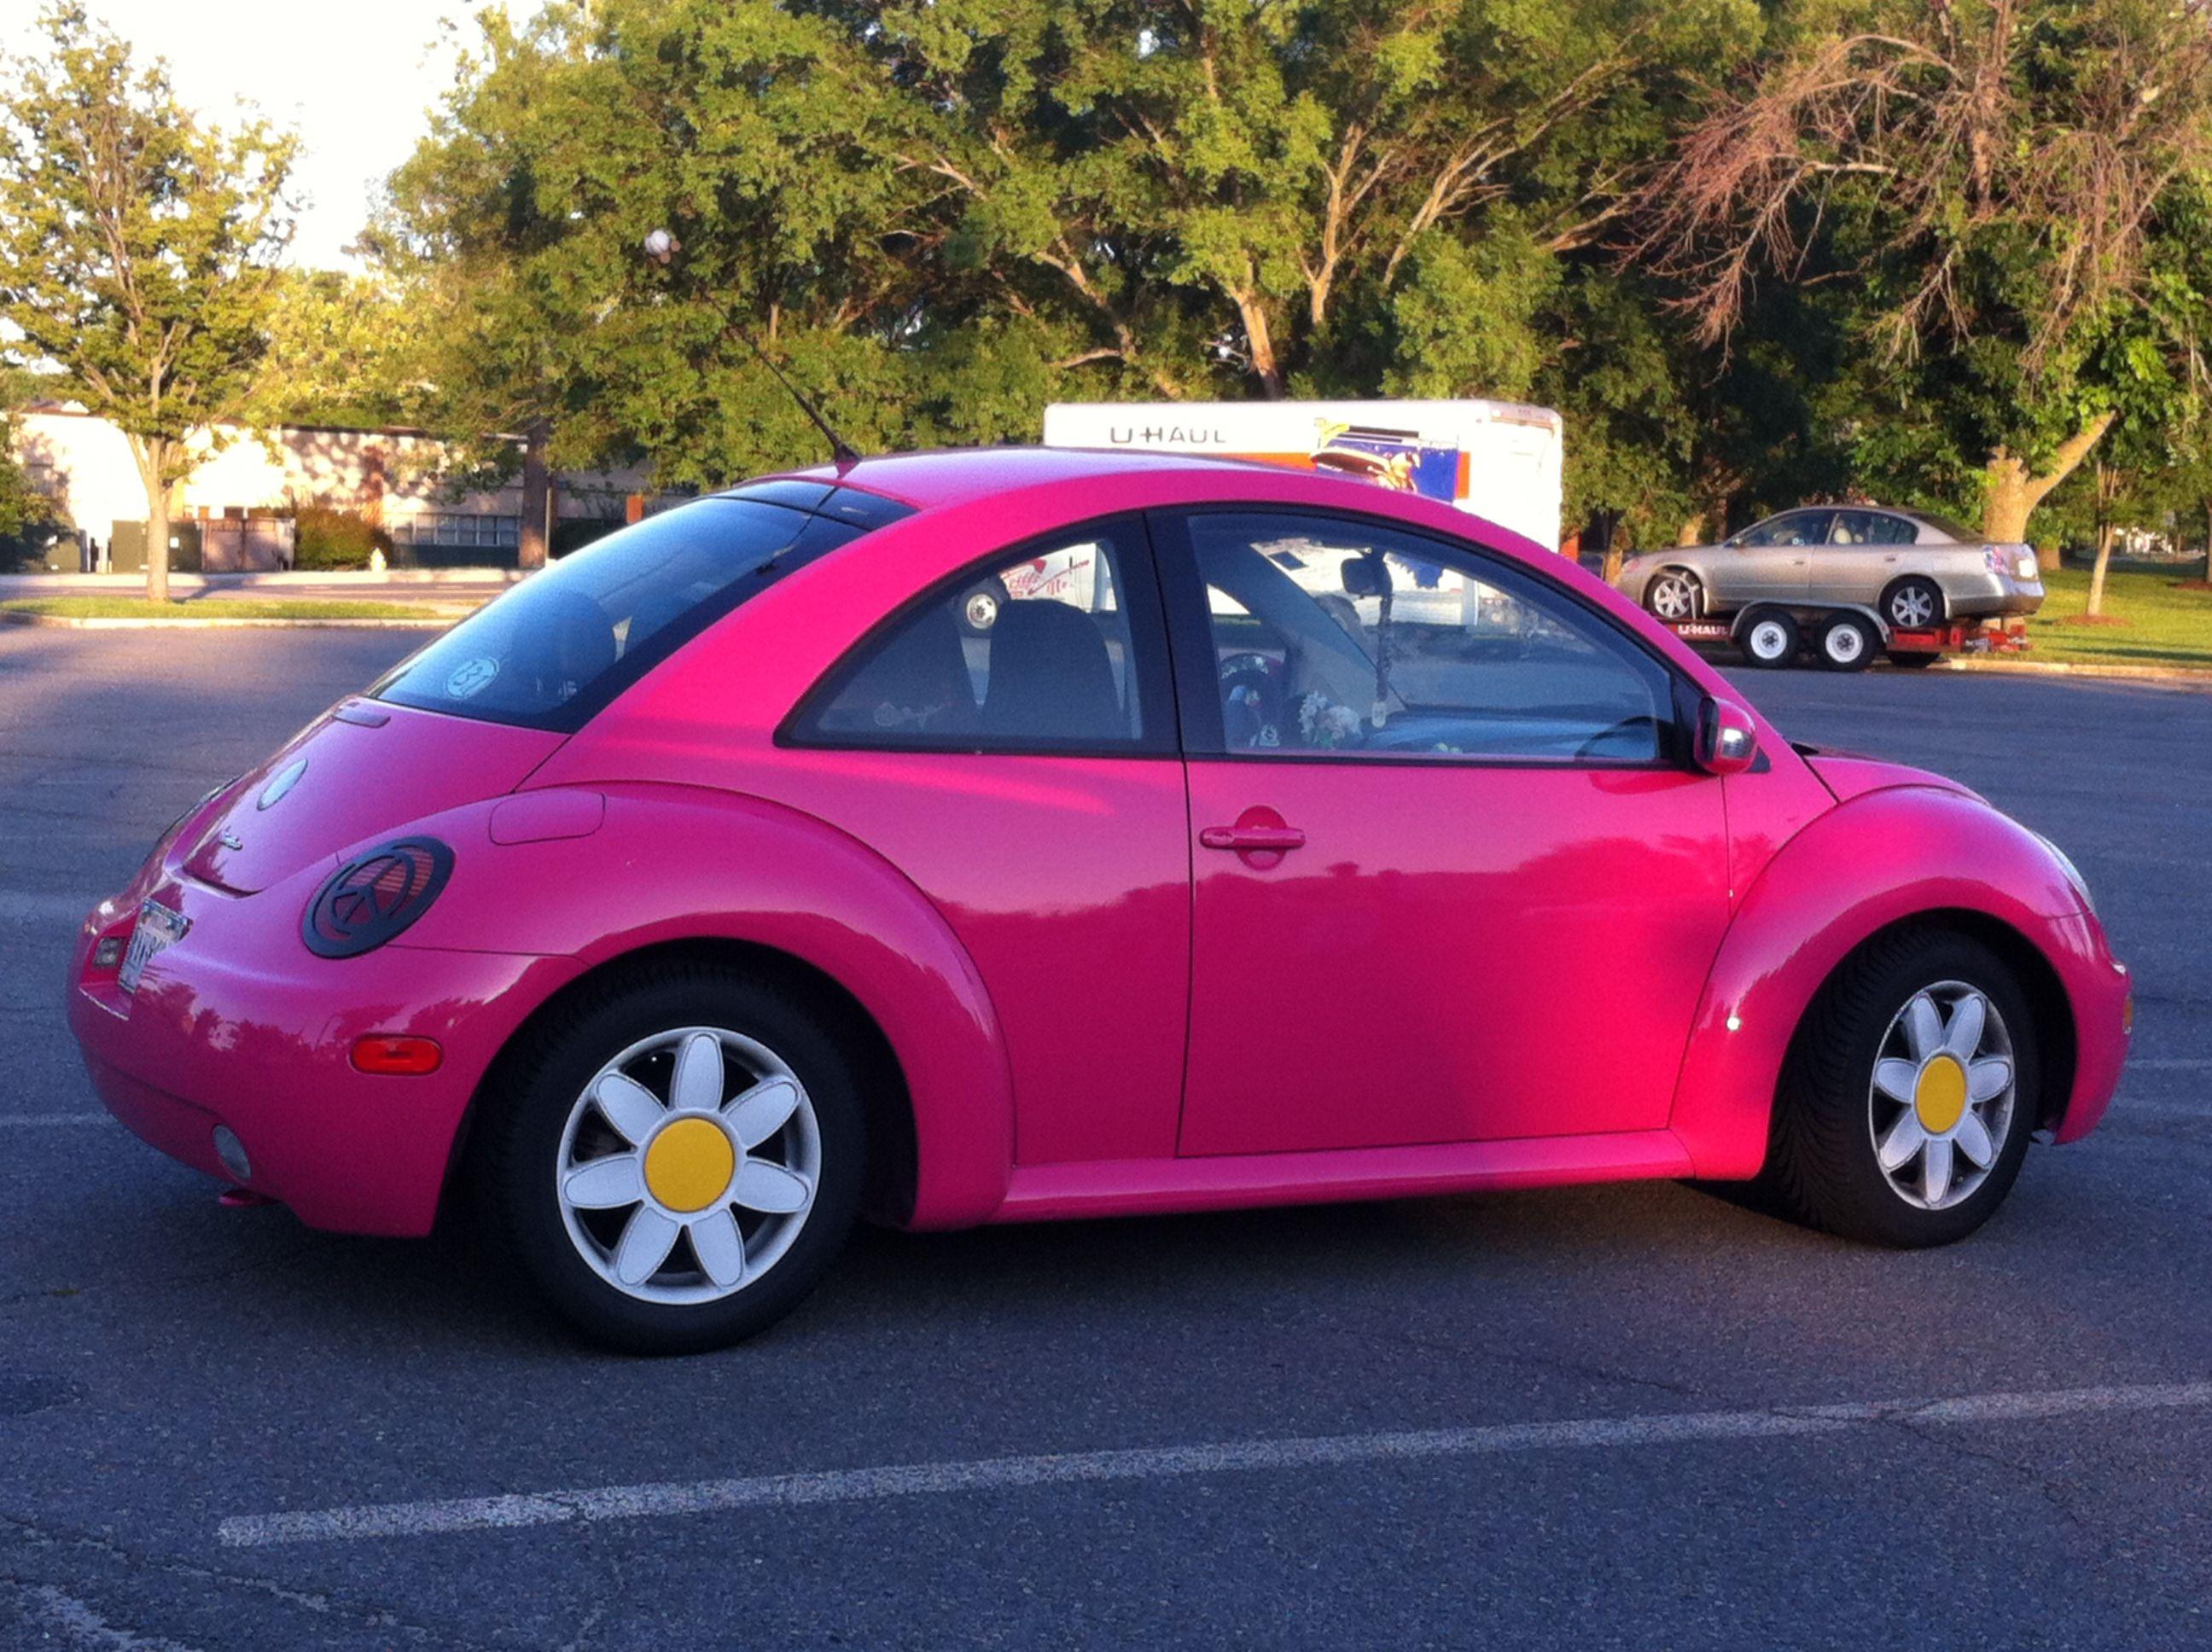 vw volkswagen listing toonagh sale pink of sold keanes beetle for